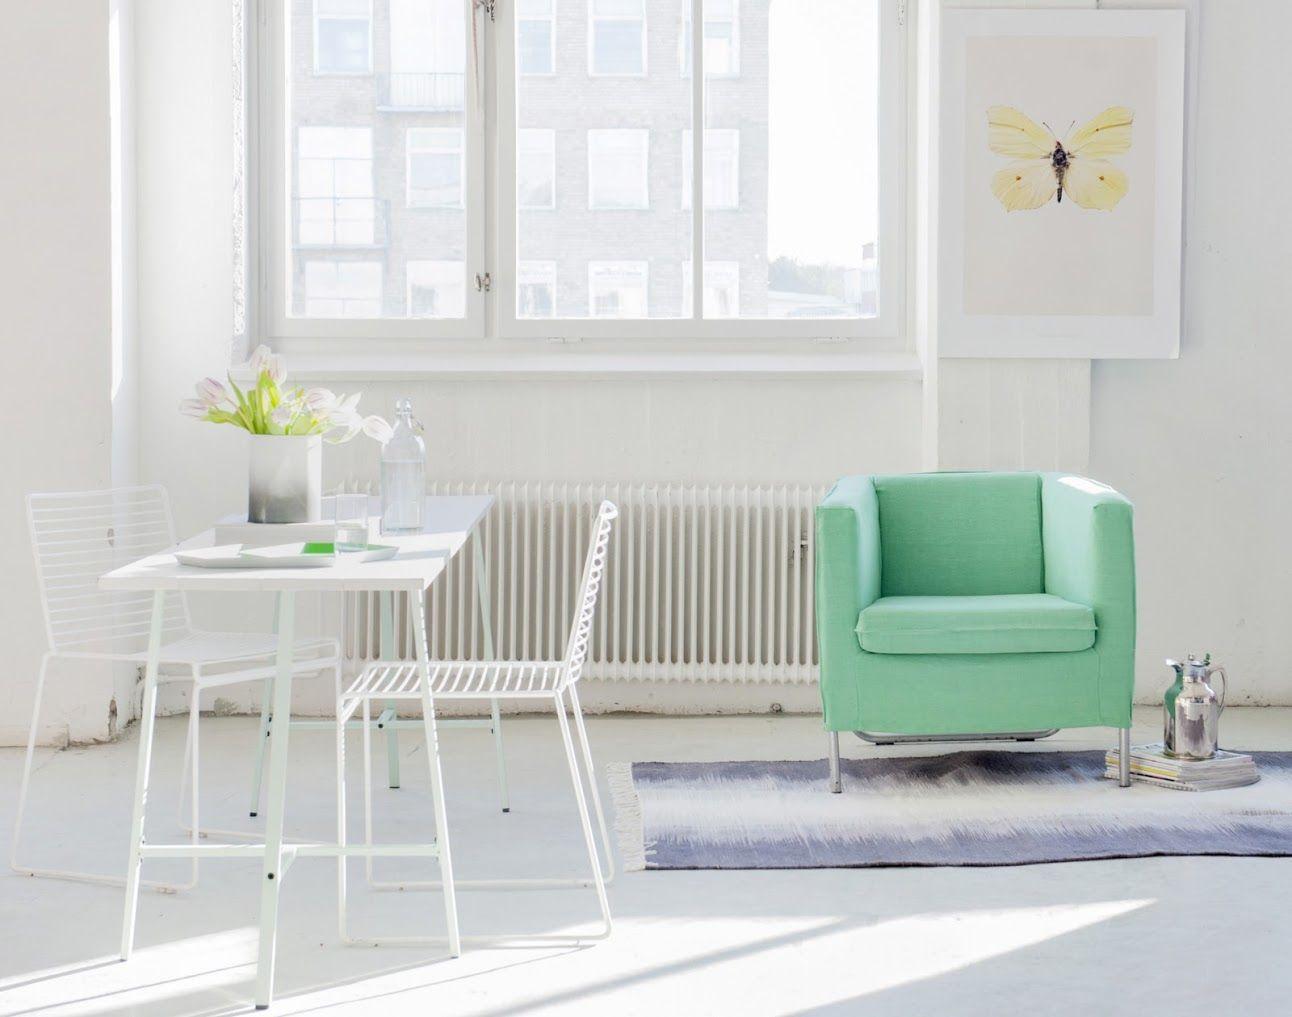 Miraculous Klappsta Armchair Cover Loose Fit Ikea Makeover Dining Inzonedesignstudio Interior Chair Design Inzonedesignstudiocom